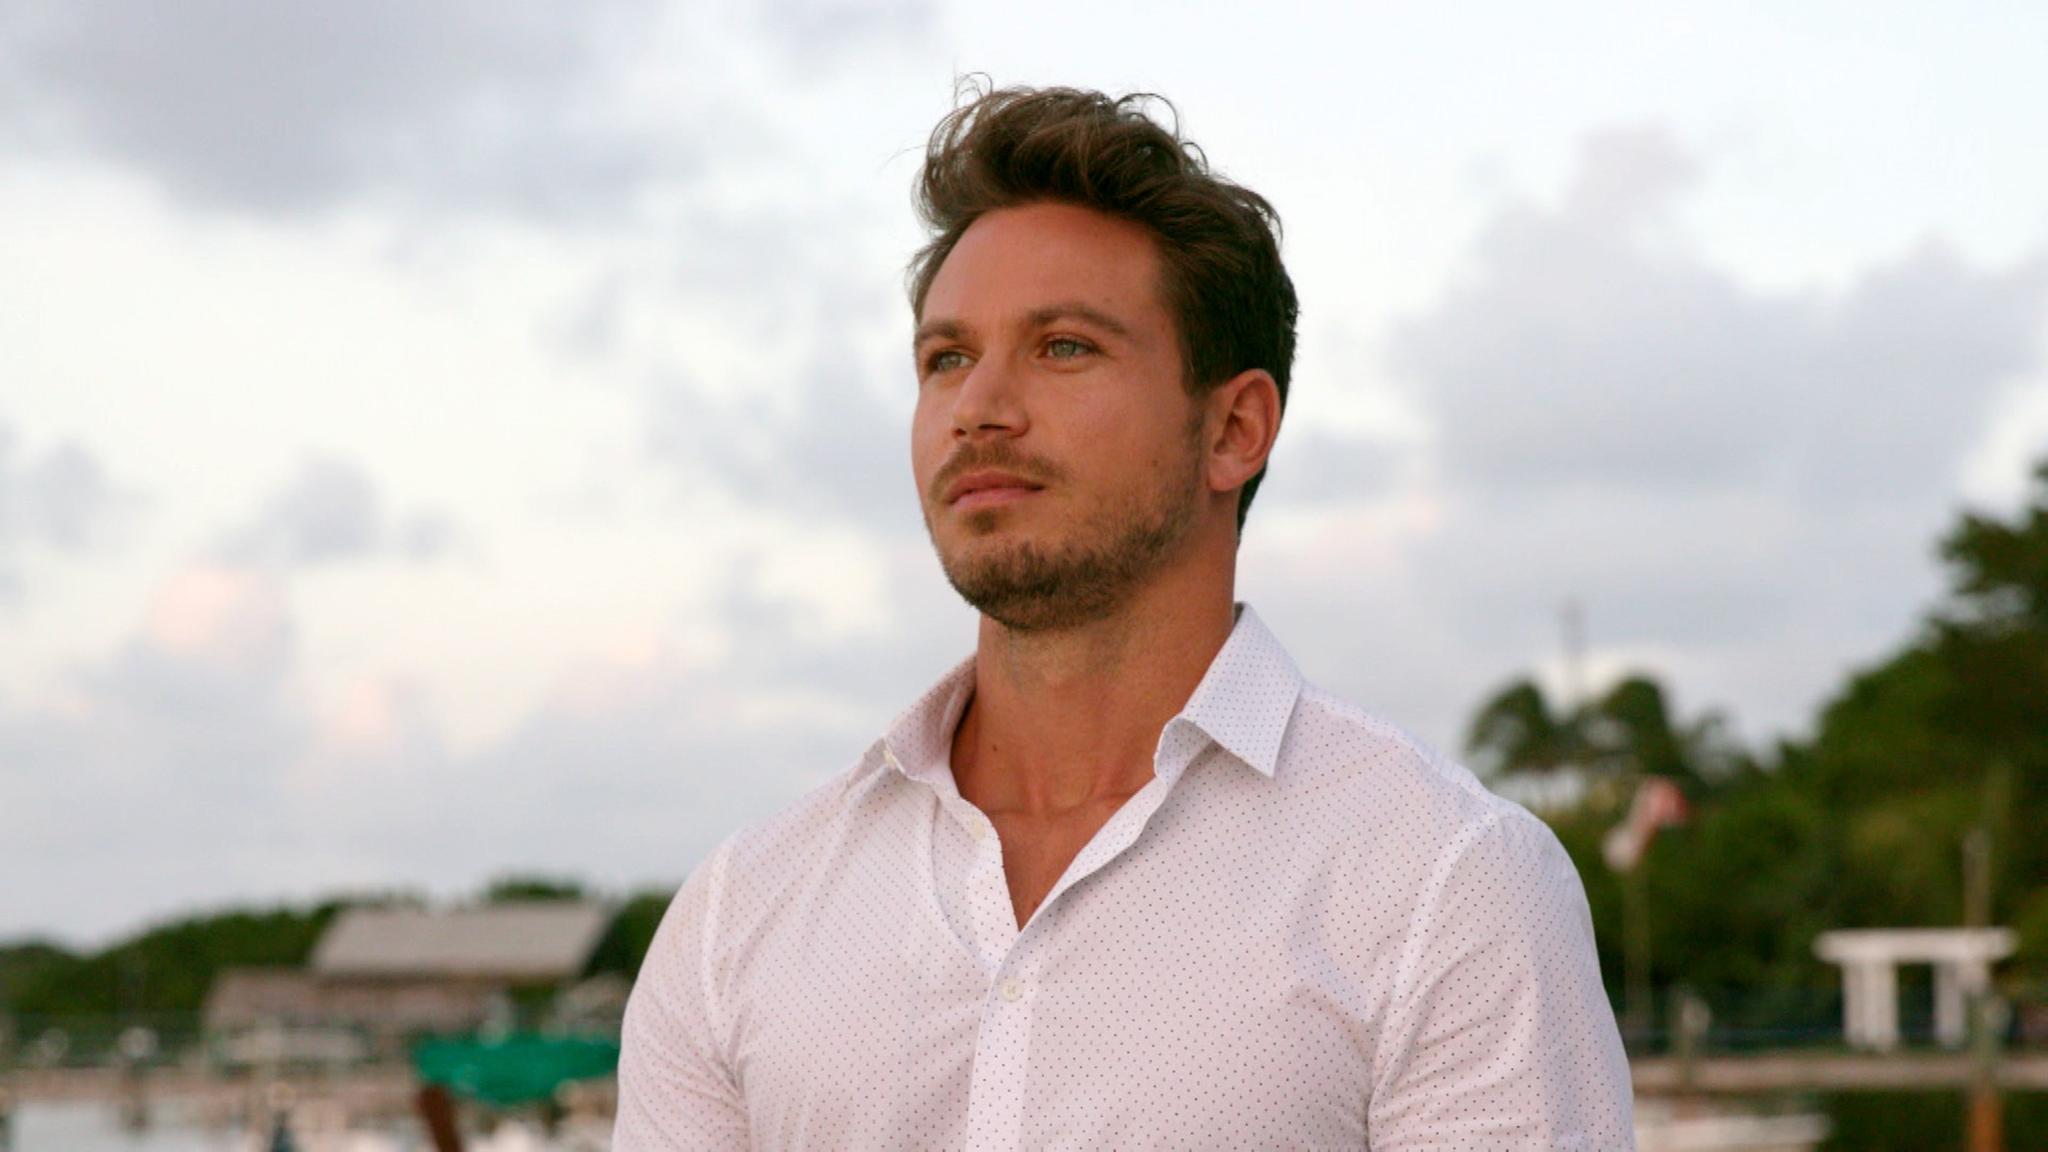 Sebastian Pannek